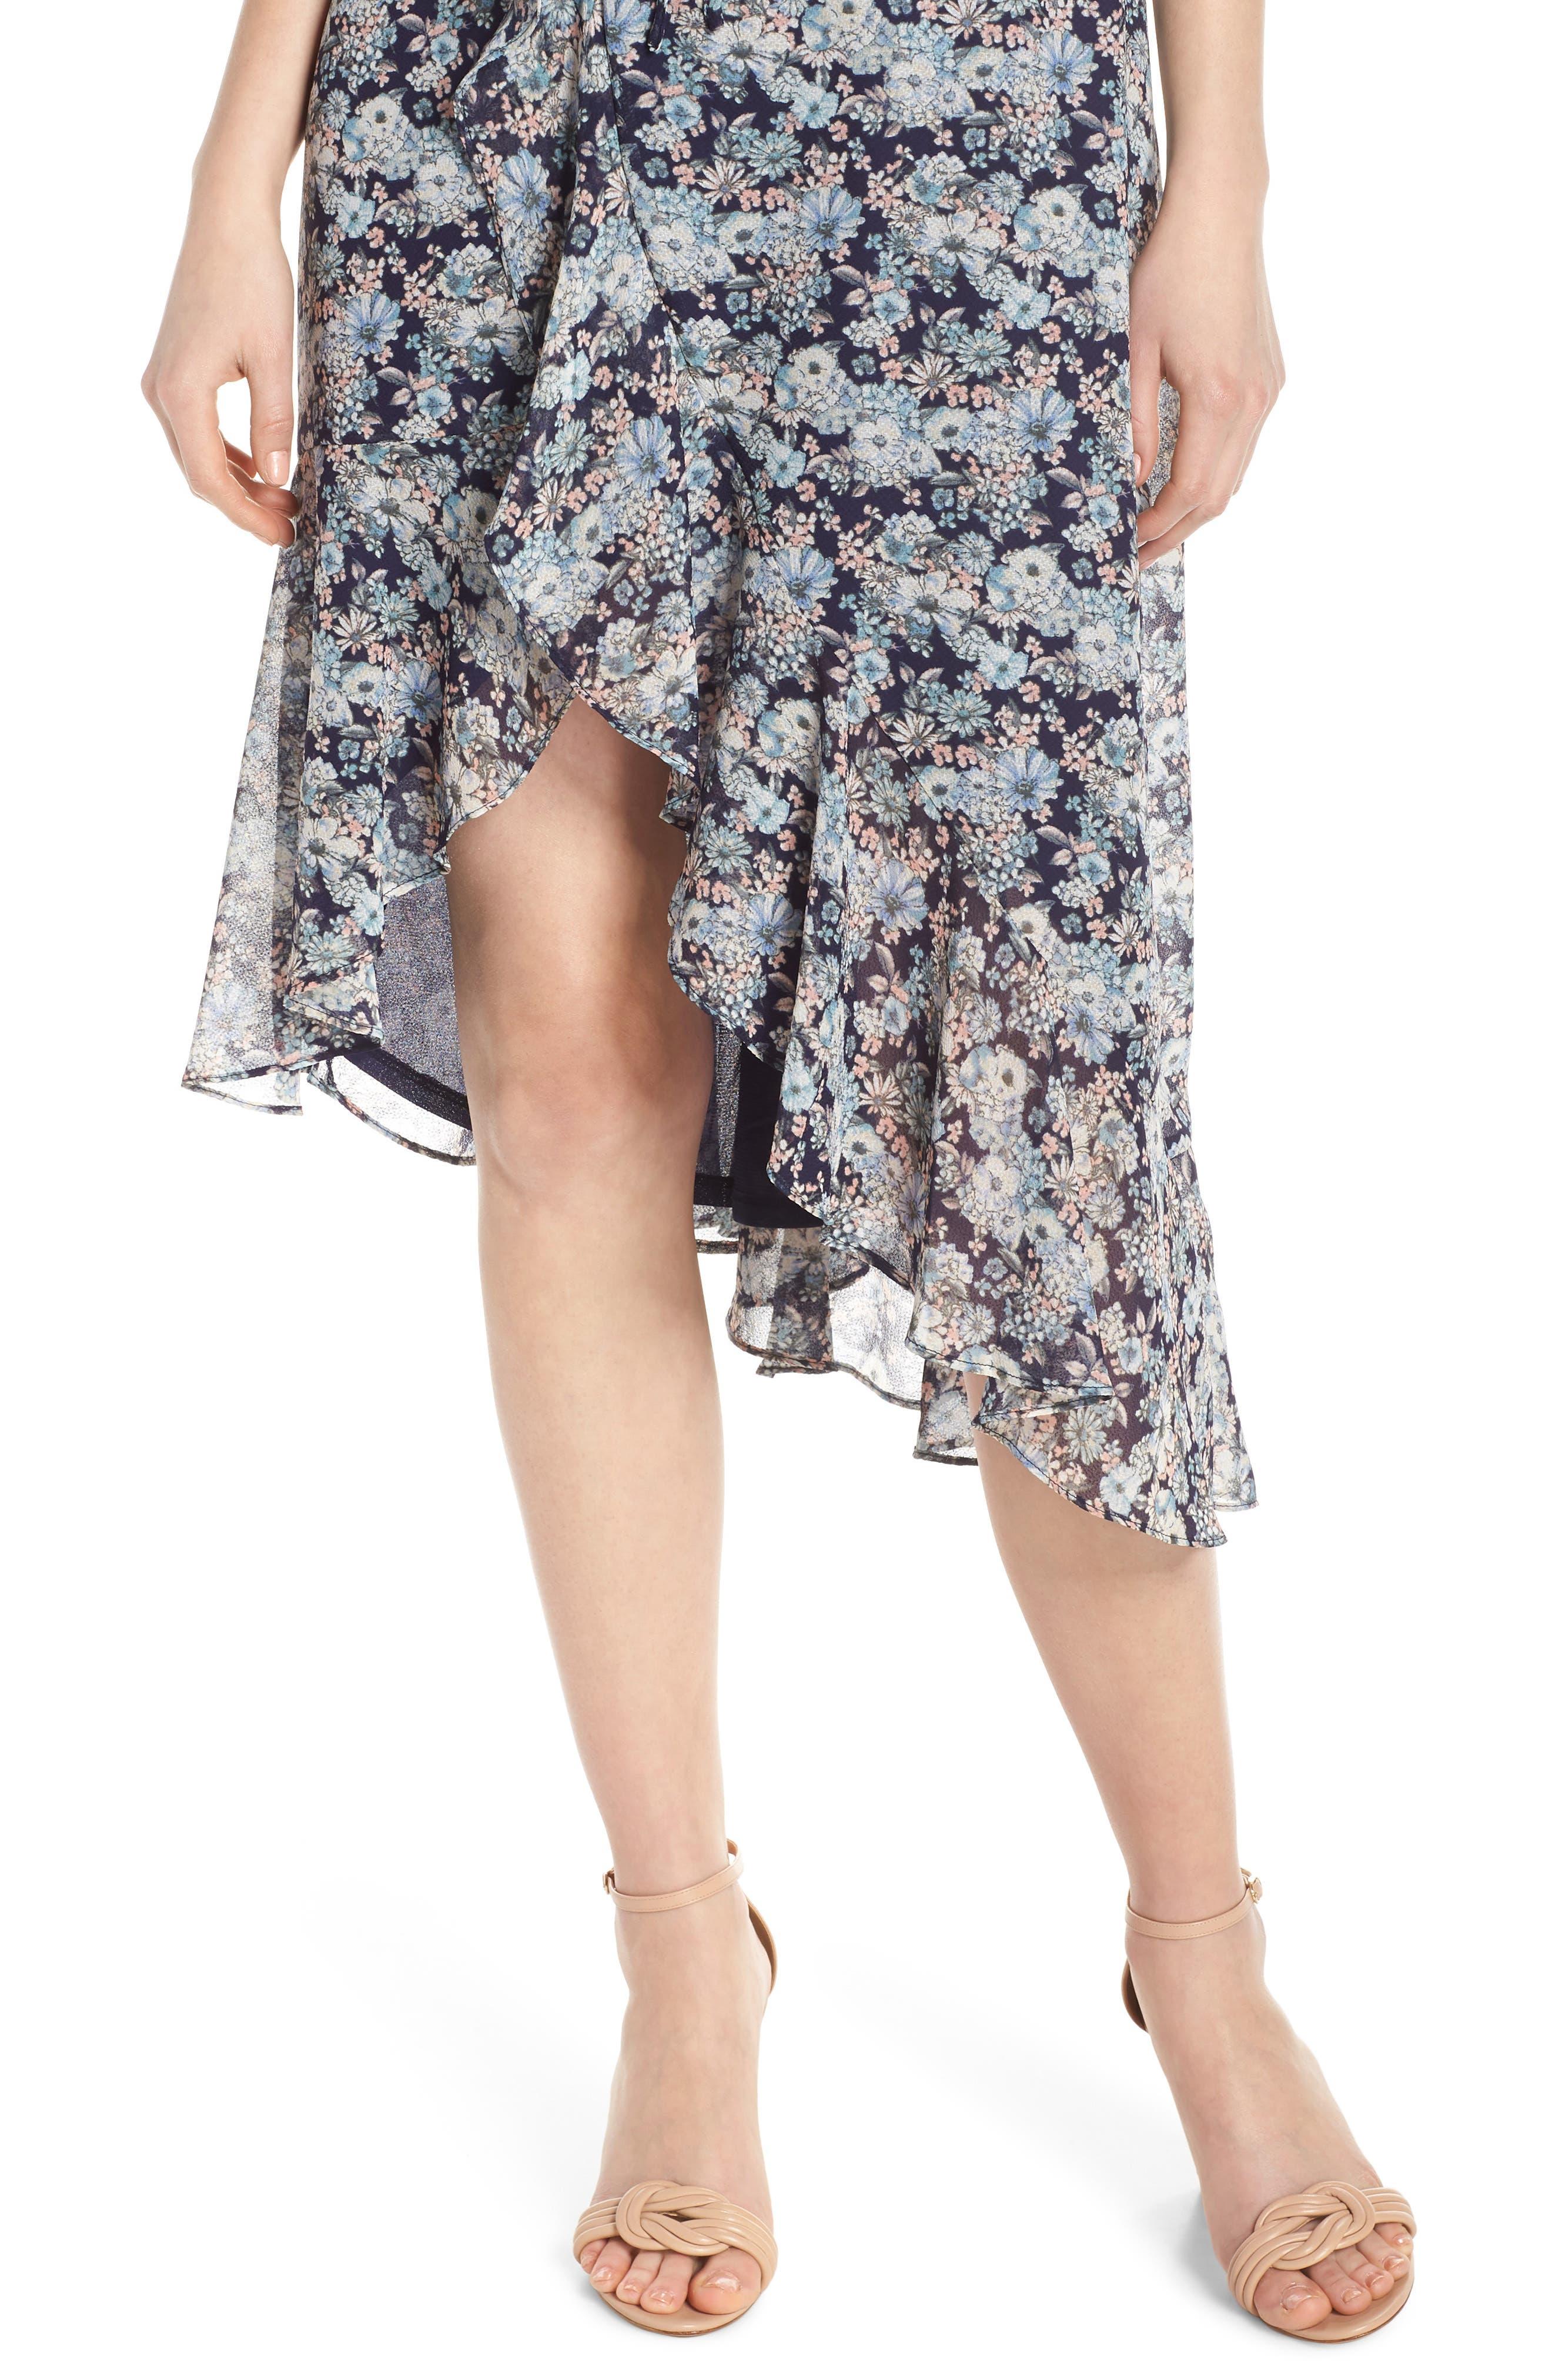 19 COOPER, Asymmetrical Ruffle Hem Dress, Alternate thumbnail 5, color, 410